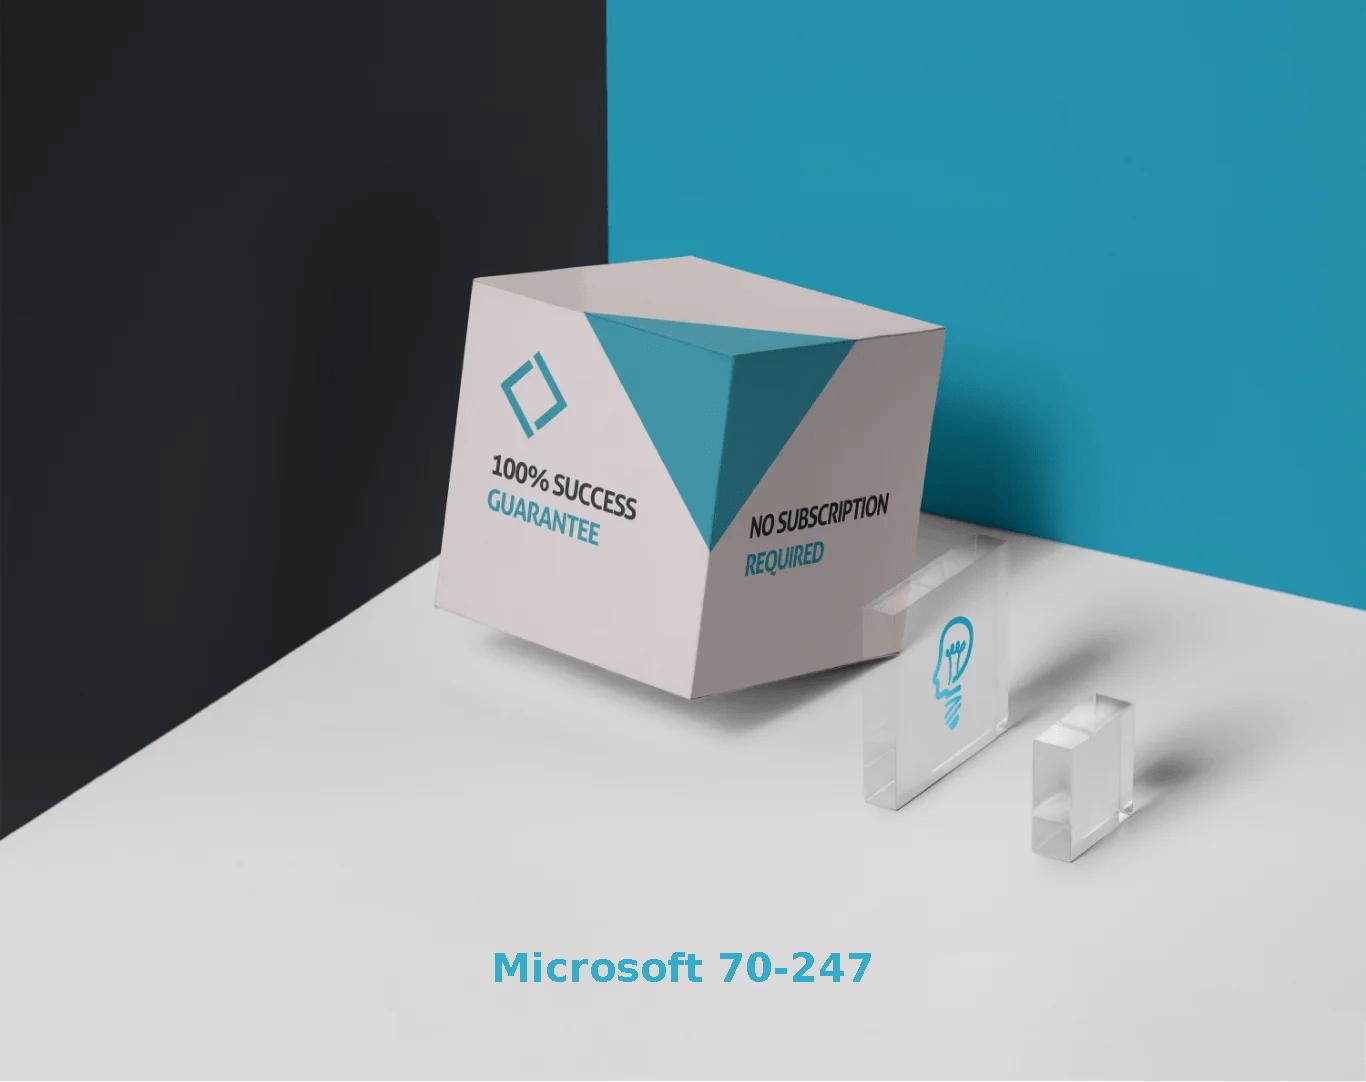 Microsoft 70-247 Exams